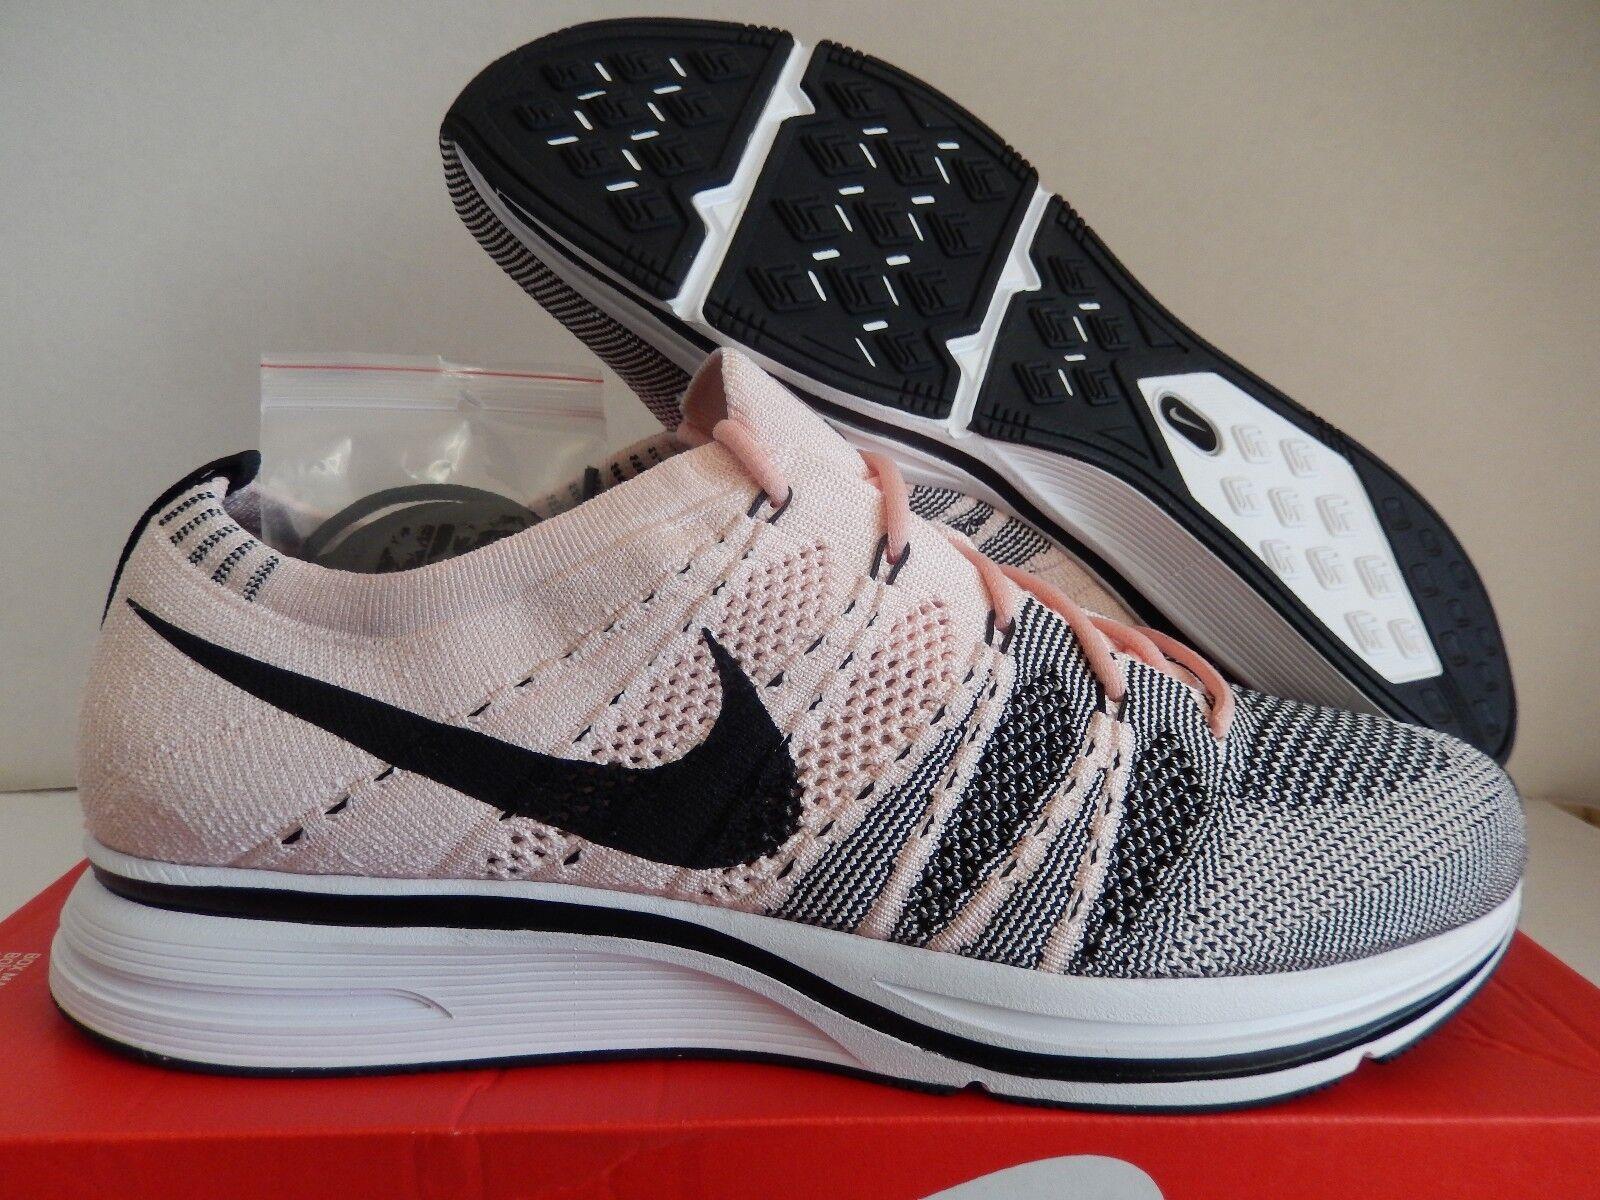 Nike flyknit trainer tramonto tint-nero-white sz - ah8396-600]